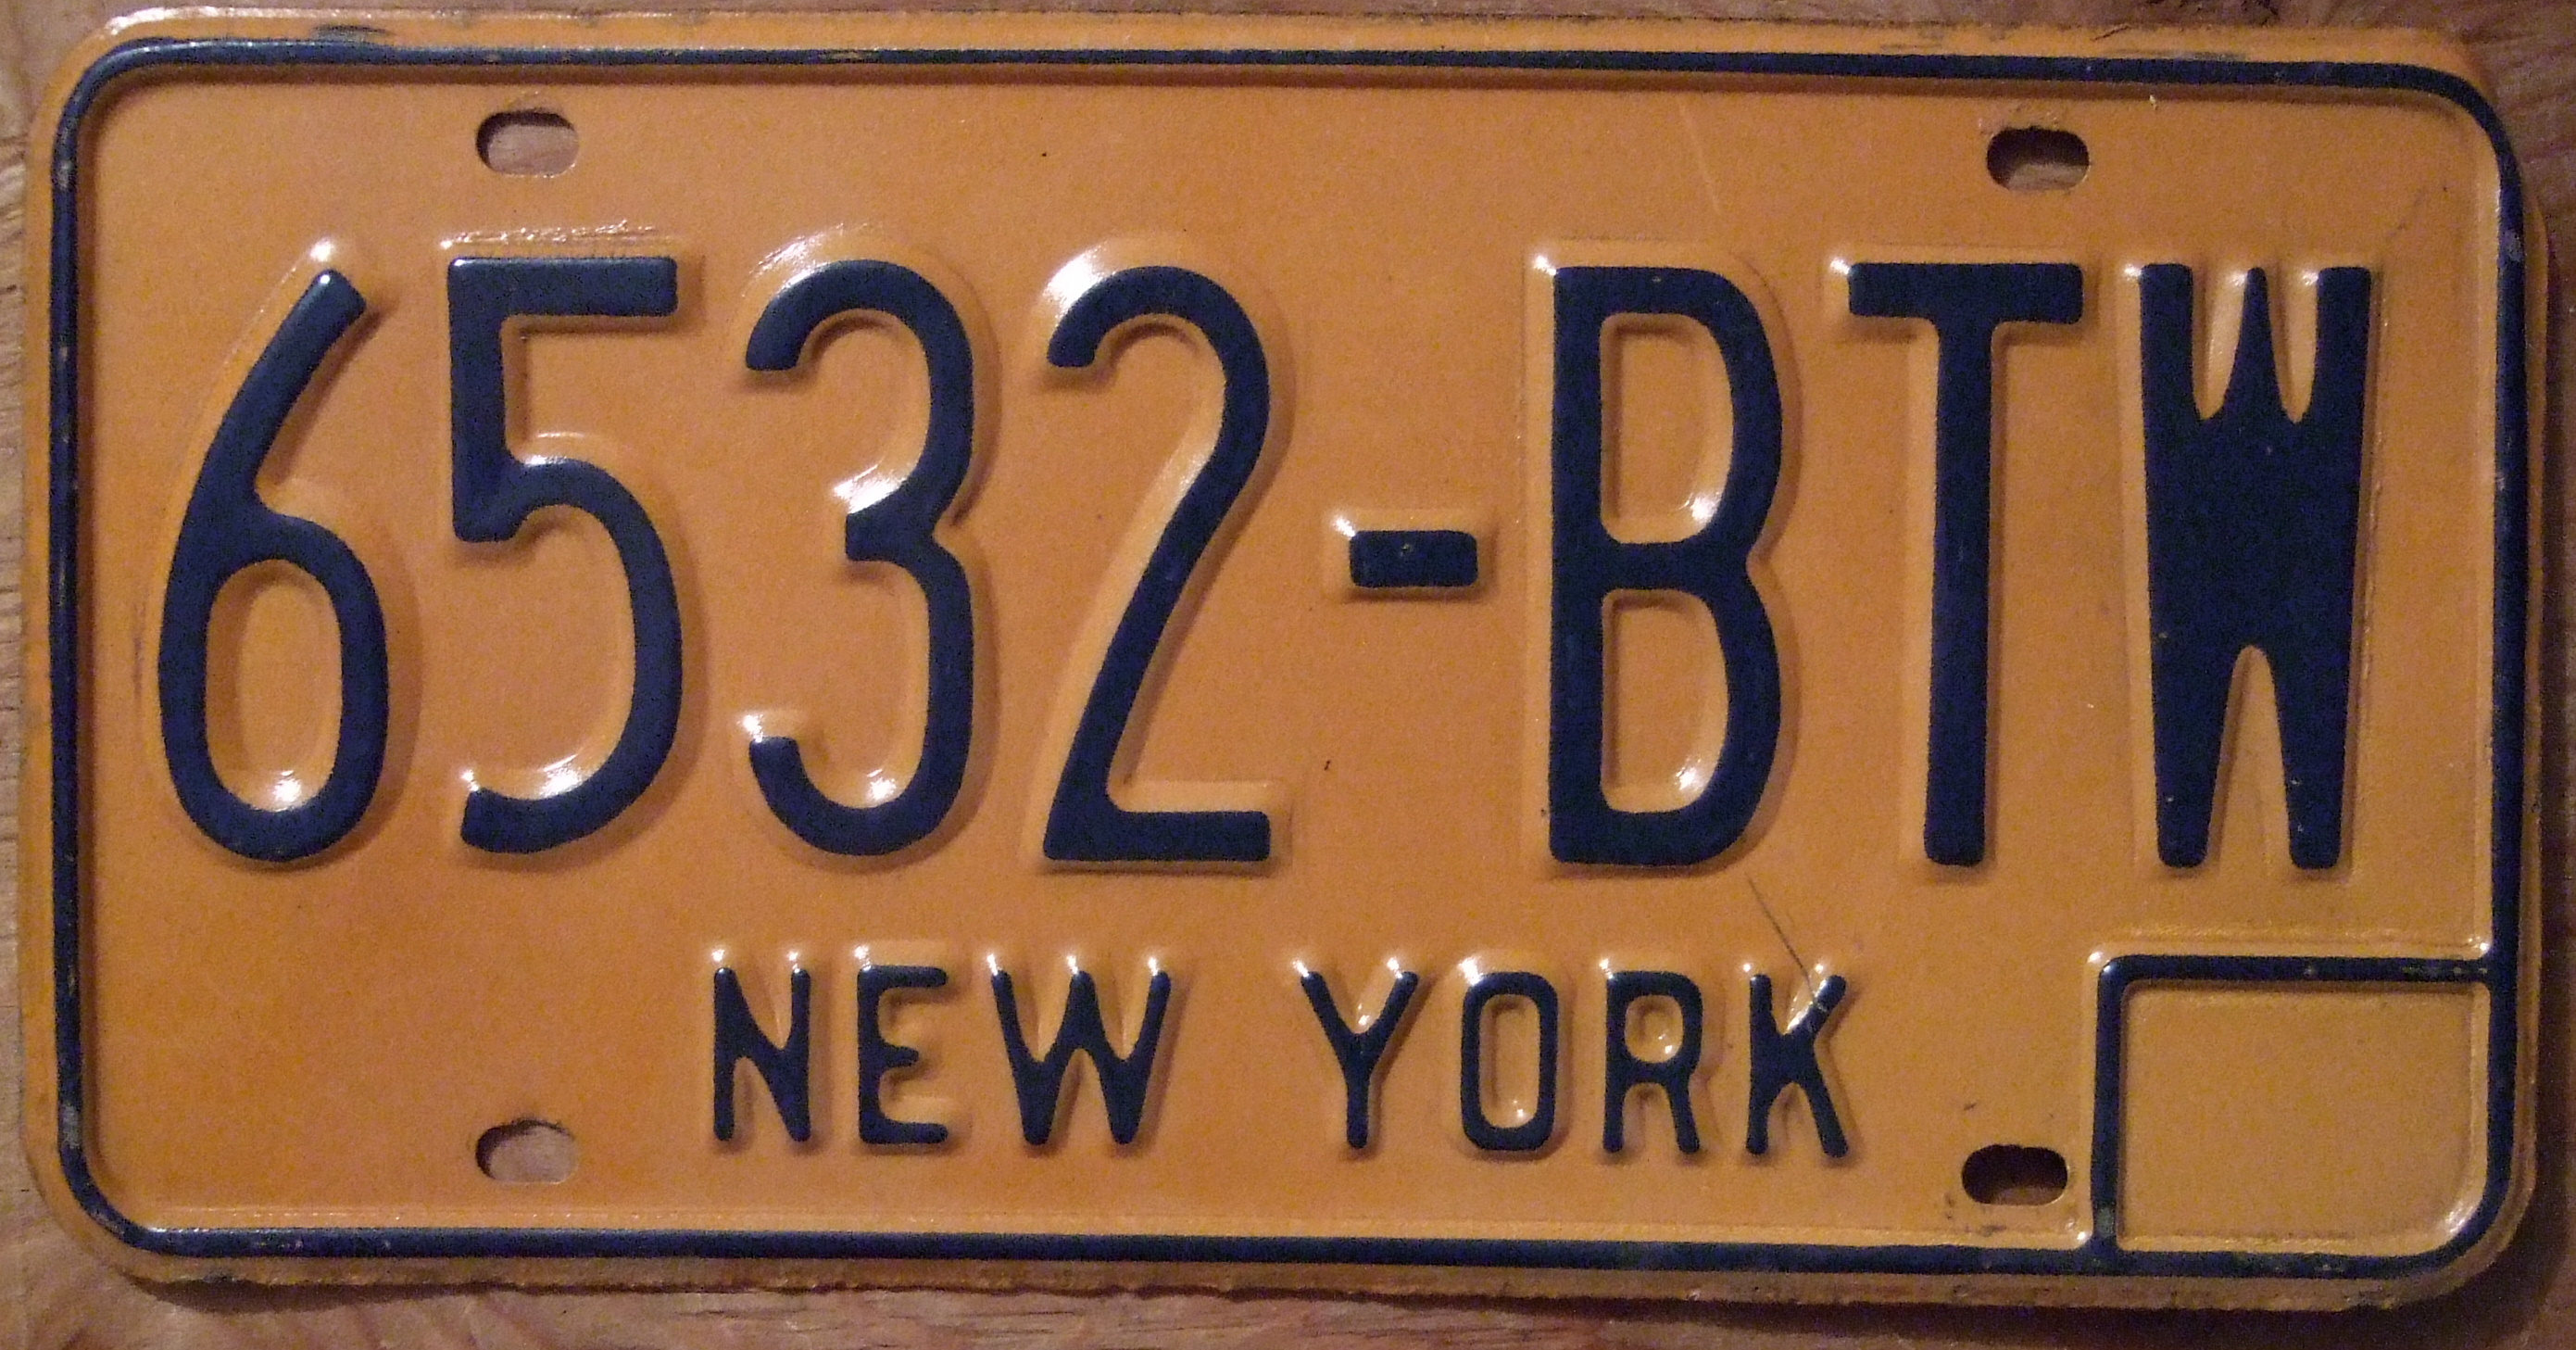 Aaa New York Car Travel Magazine